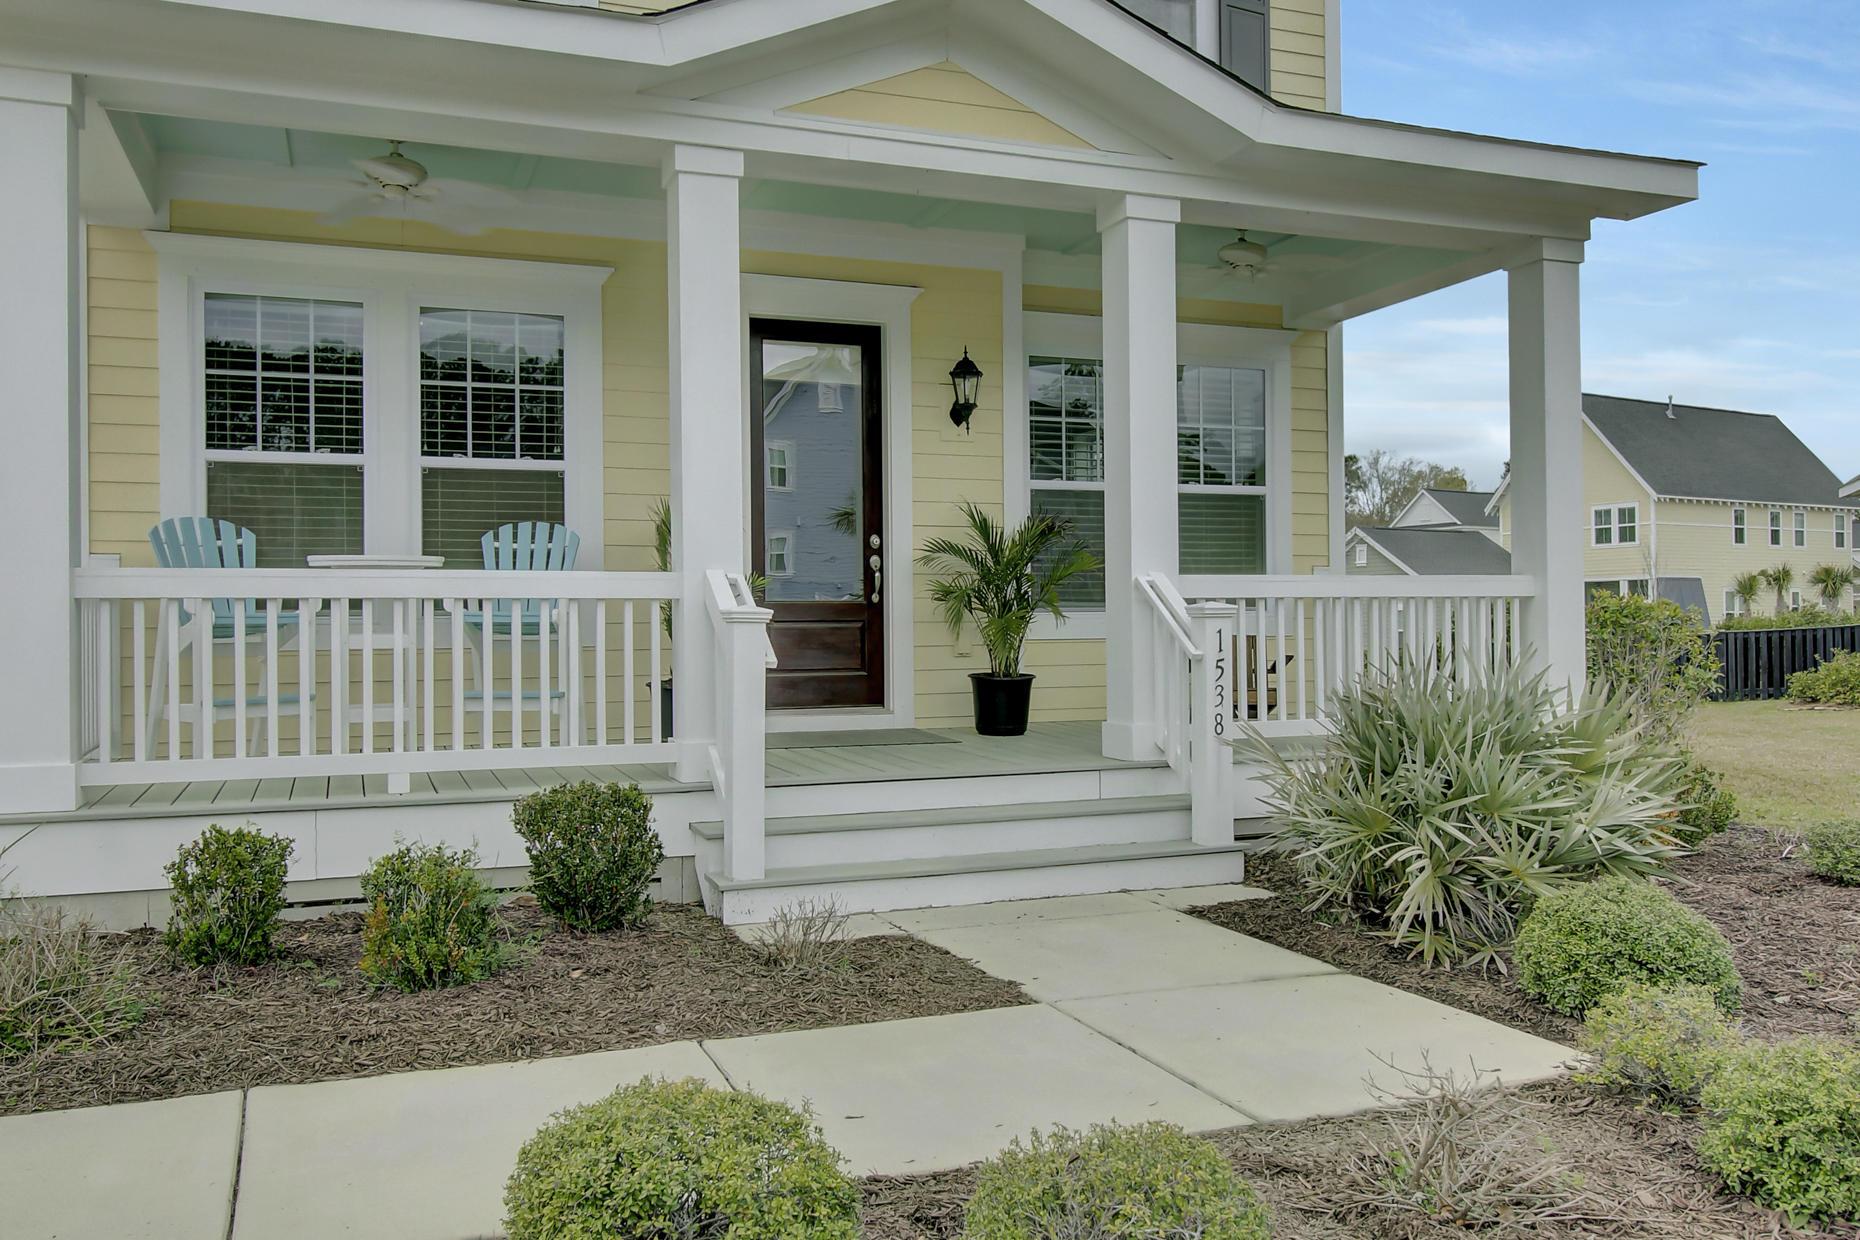 Carolina Park Homes For Sale - 1538 New Chapel, Mount Pleasant, SC - 13